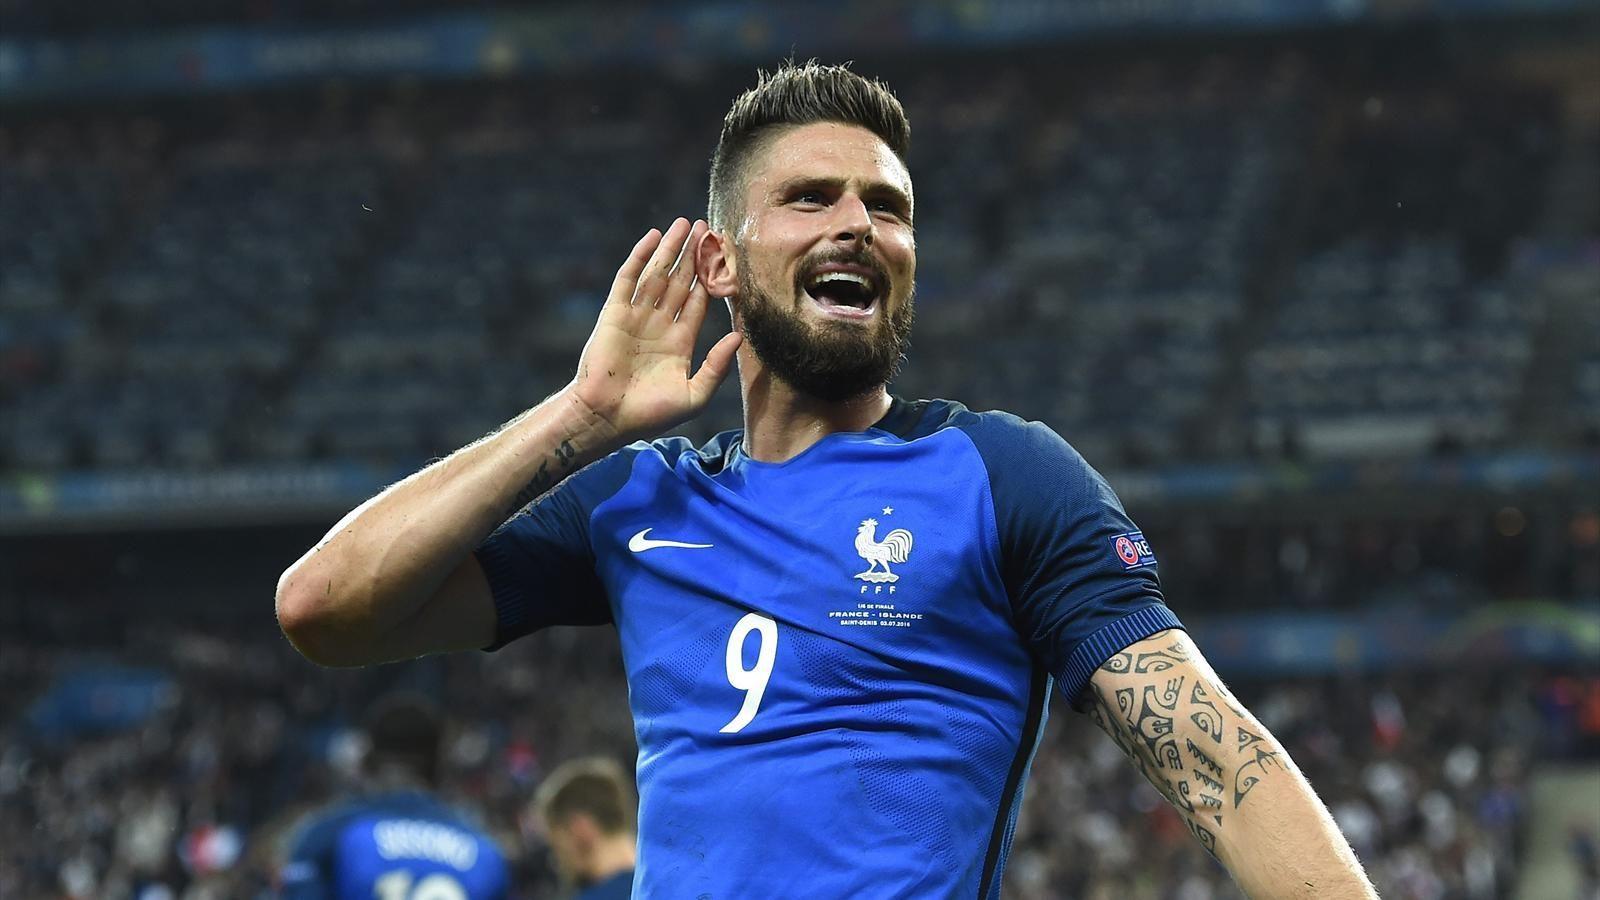 France Suede Foot Resume